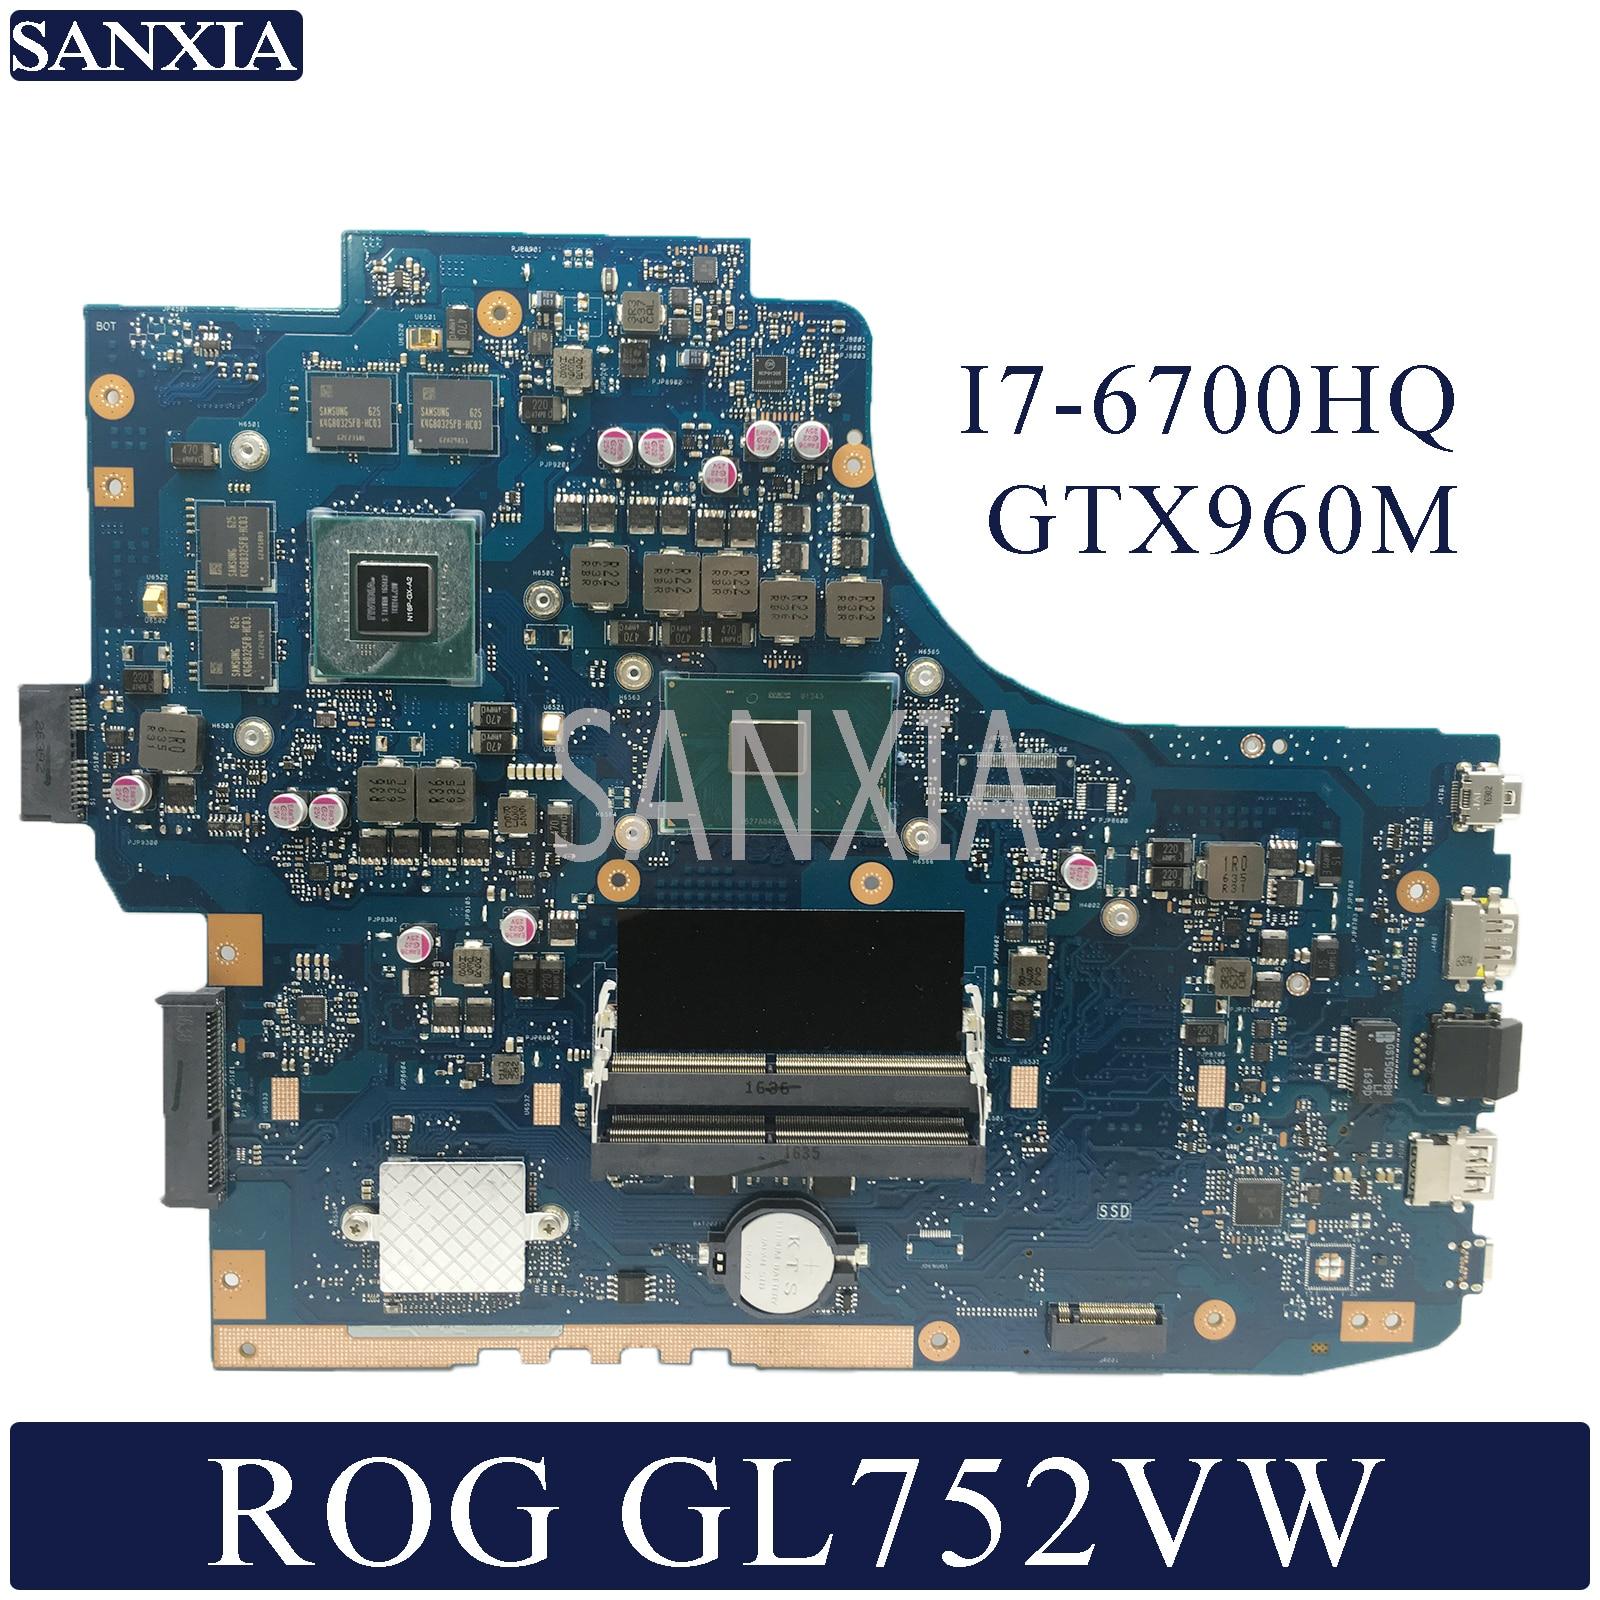 KEFU Laptop motherboard para ASUS ROG GL752VW Teste mainboard original HM170 I7-6700HQ GTX960M-2GB/4 GB